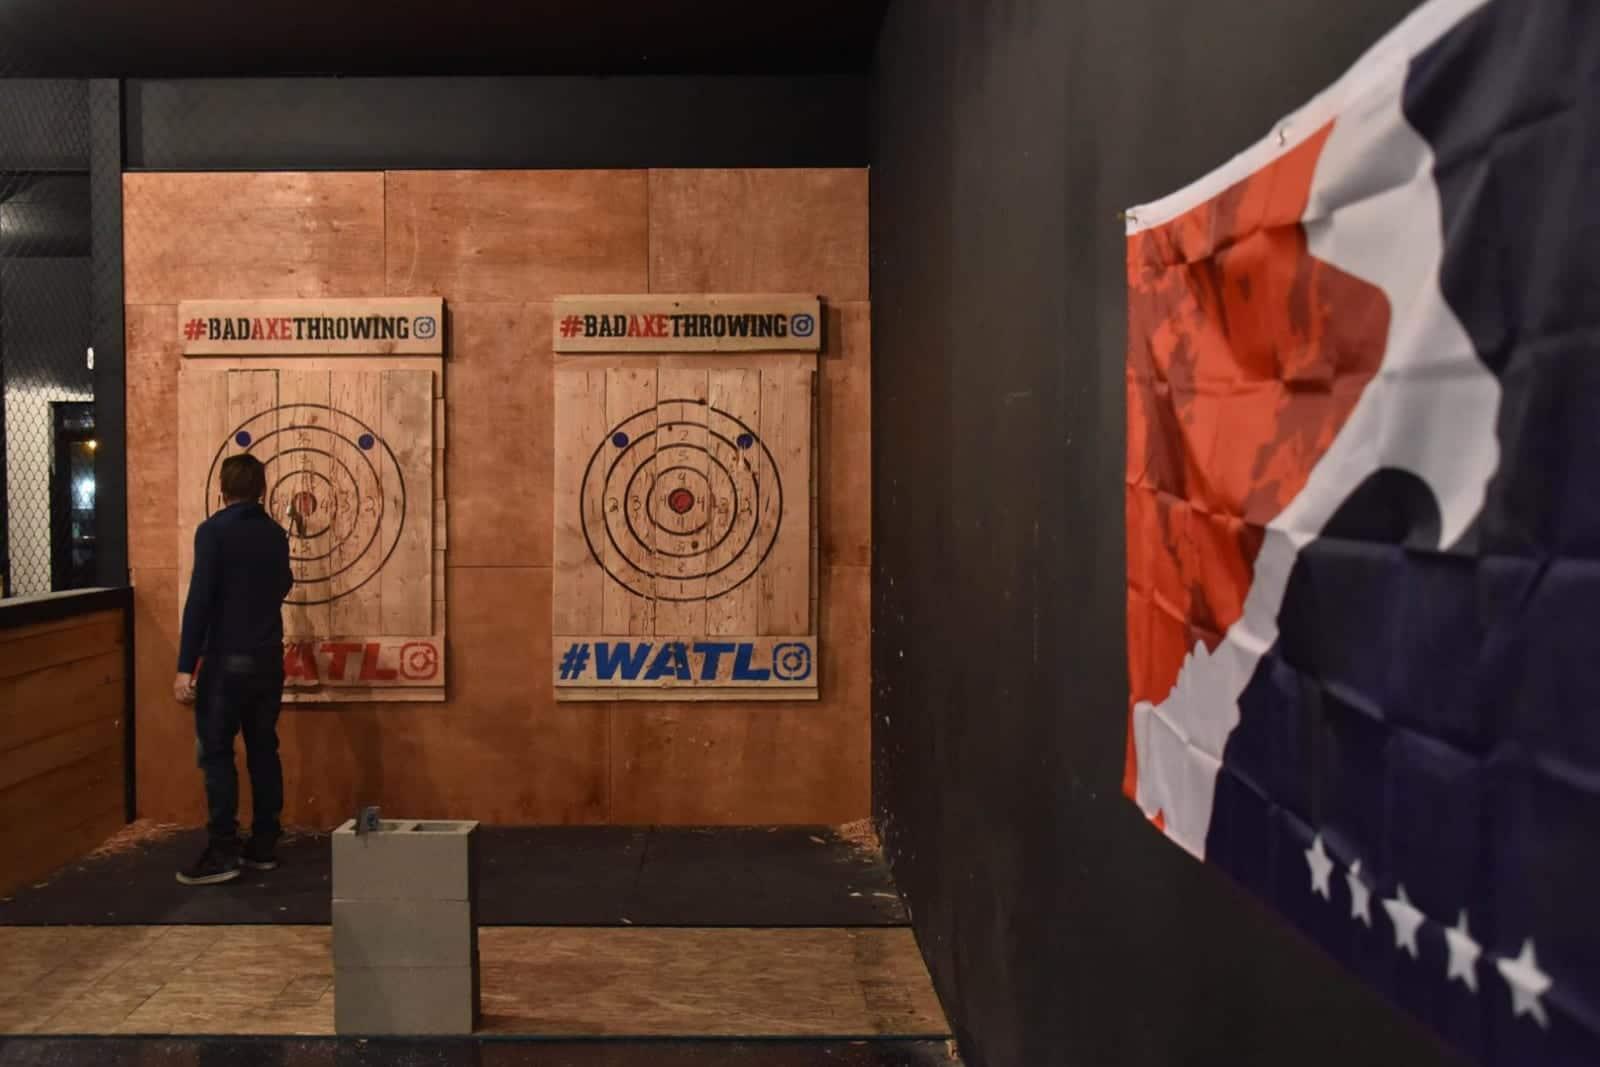 Bad Axe Throwing Denver CO Targets